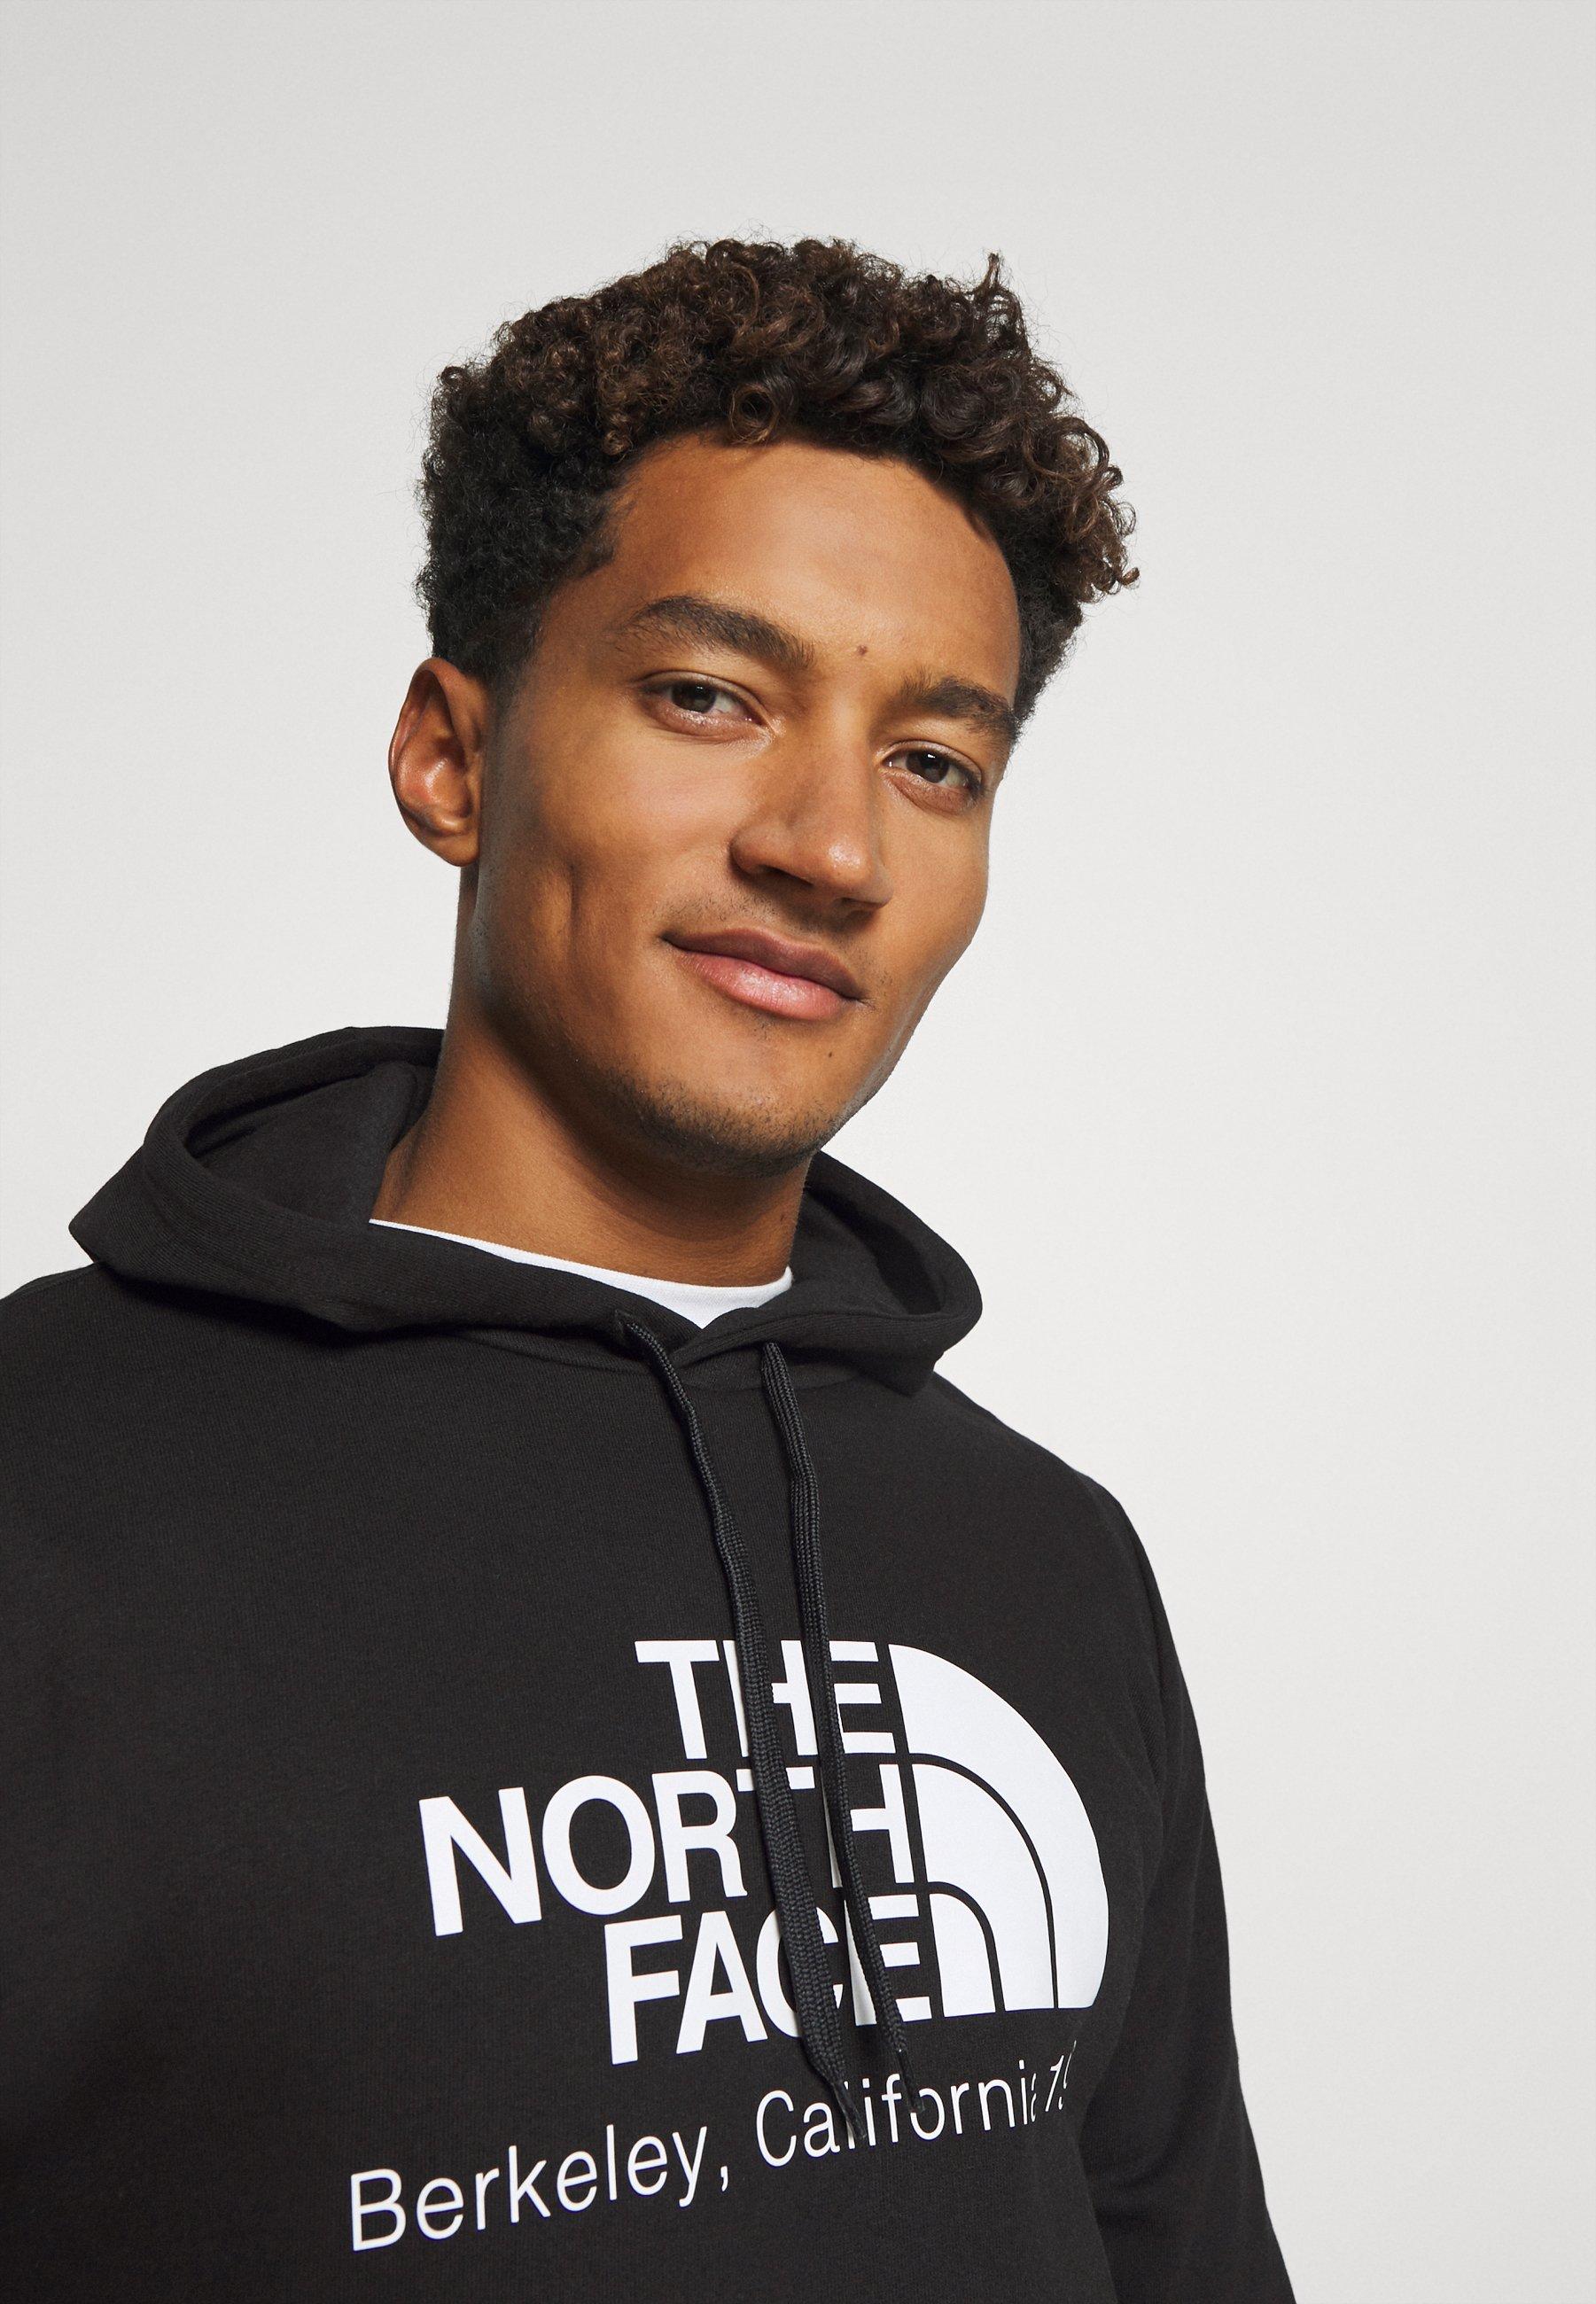 The North Face BERKELEY CALIFORNIA HOODIE Sweater medium